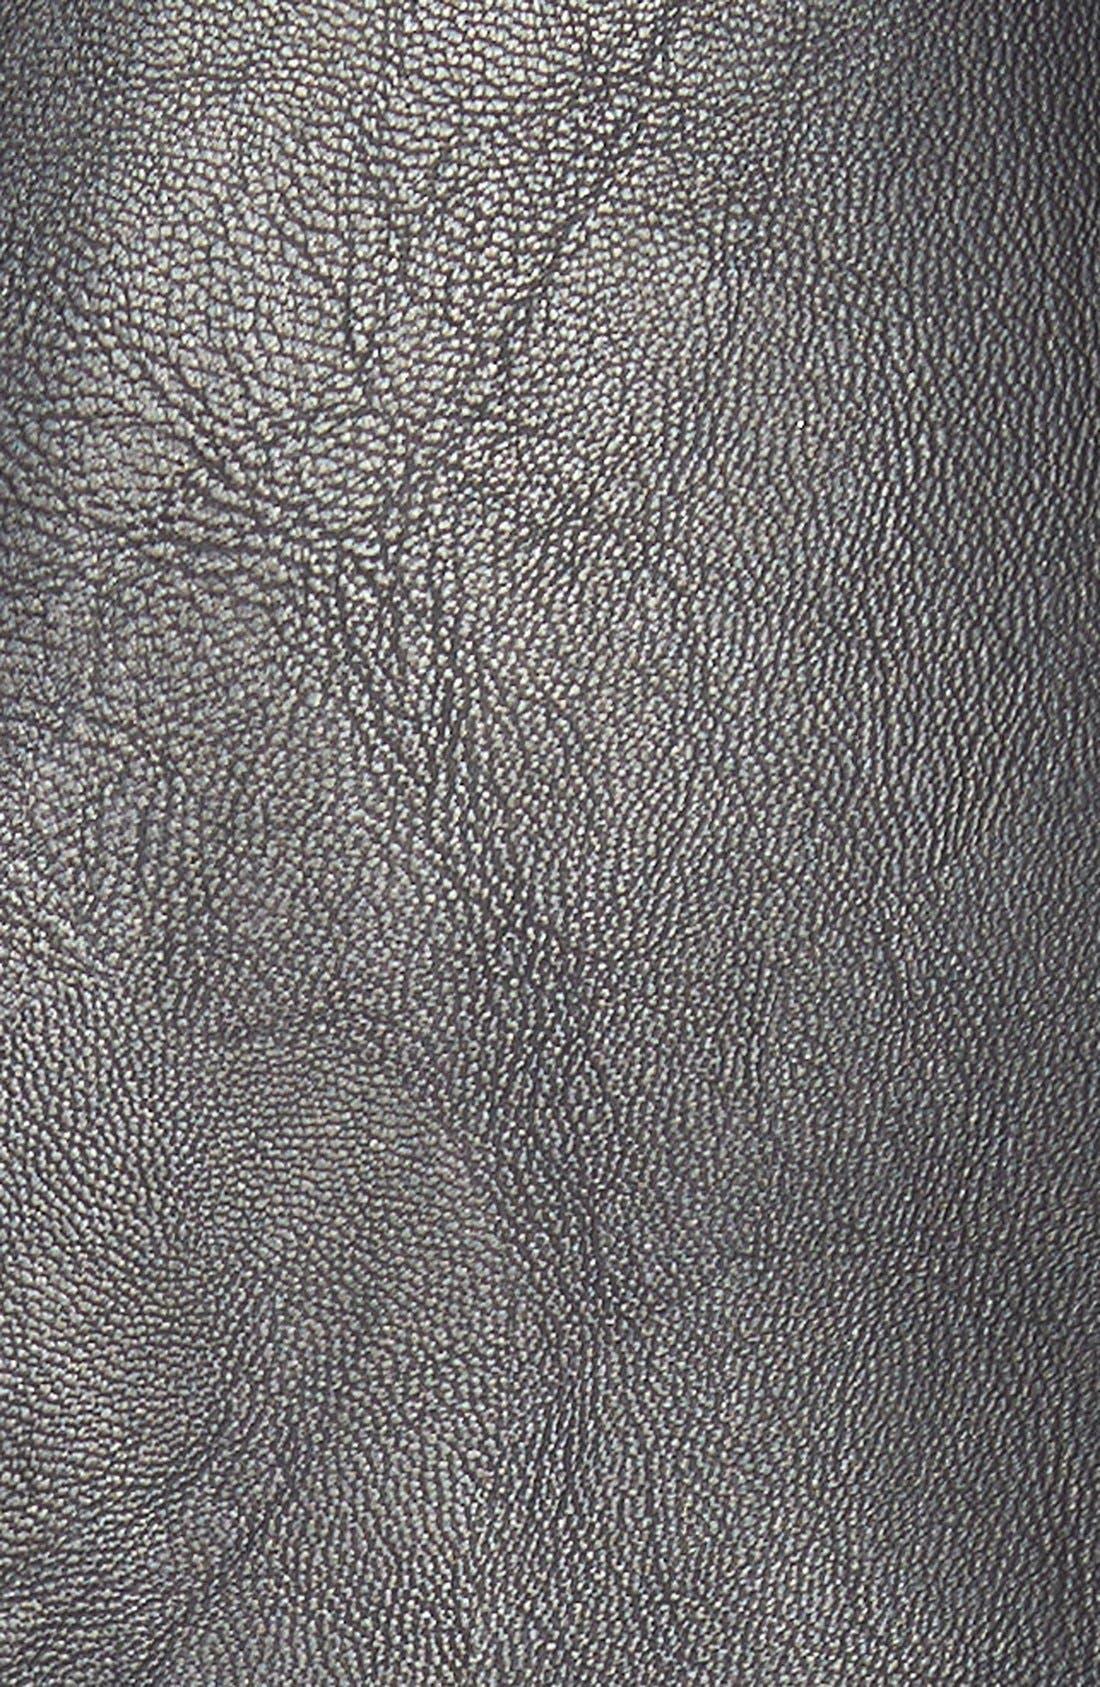 Faux Leather Midi Skirt,                             Alternate thumbnail 2, color,                             001